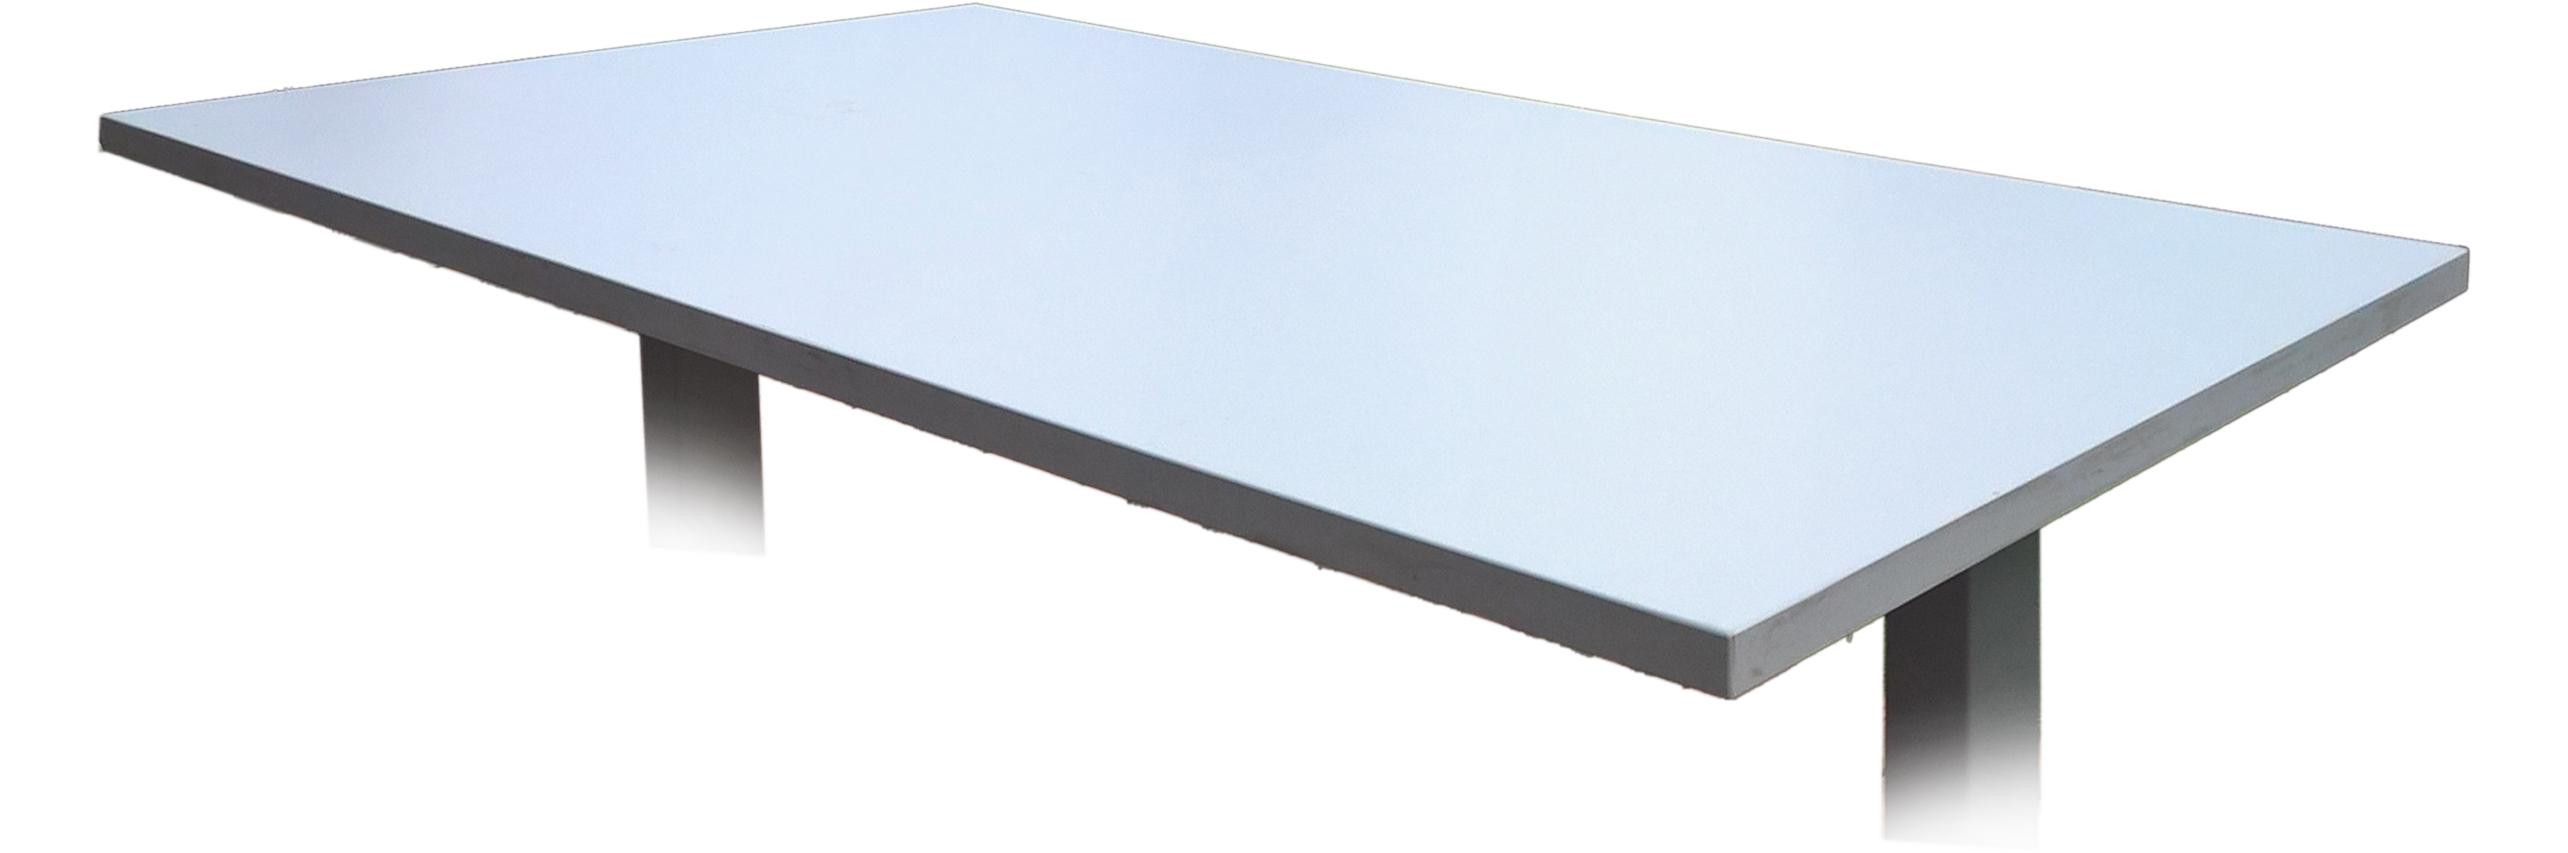 Prostokąt 140×80 cm